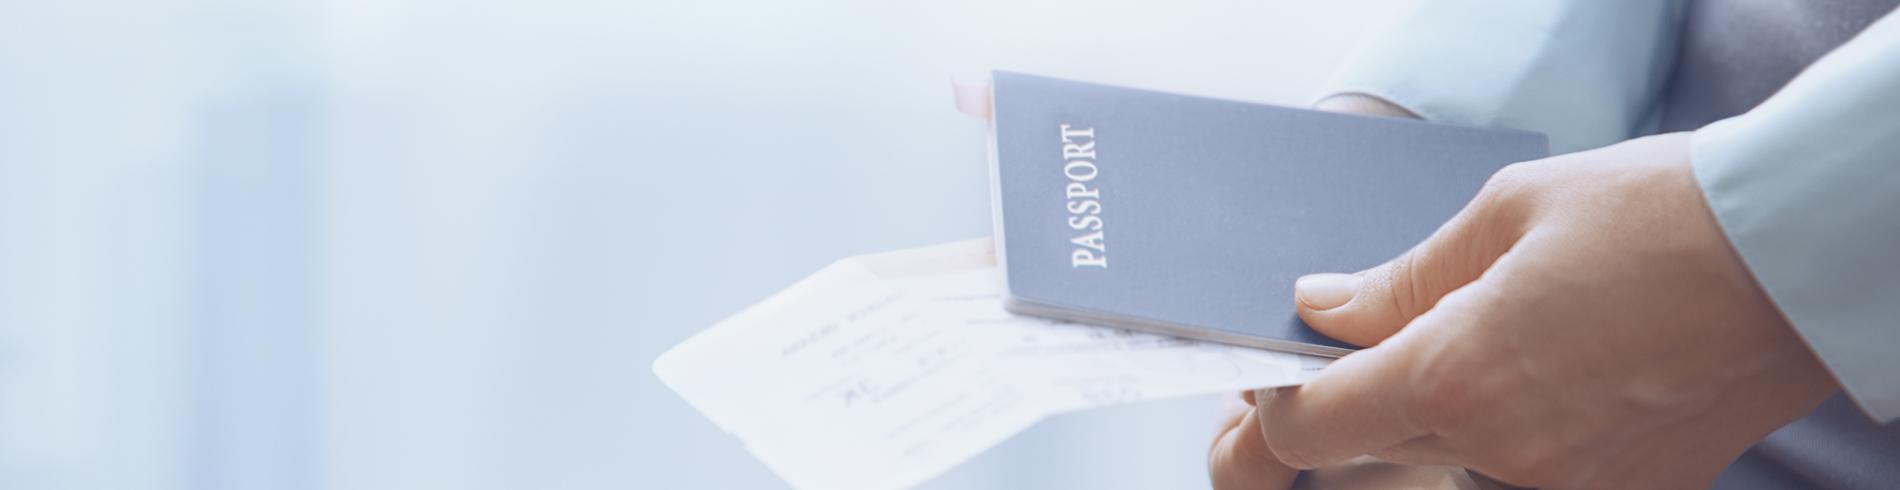 Decesos-residentes-extranjeros